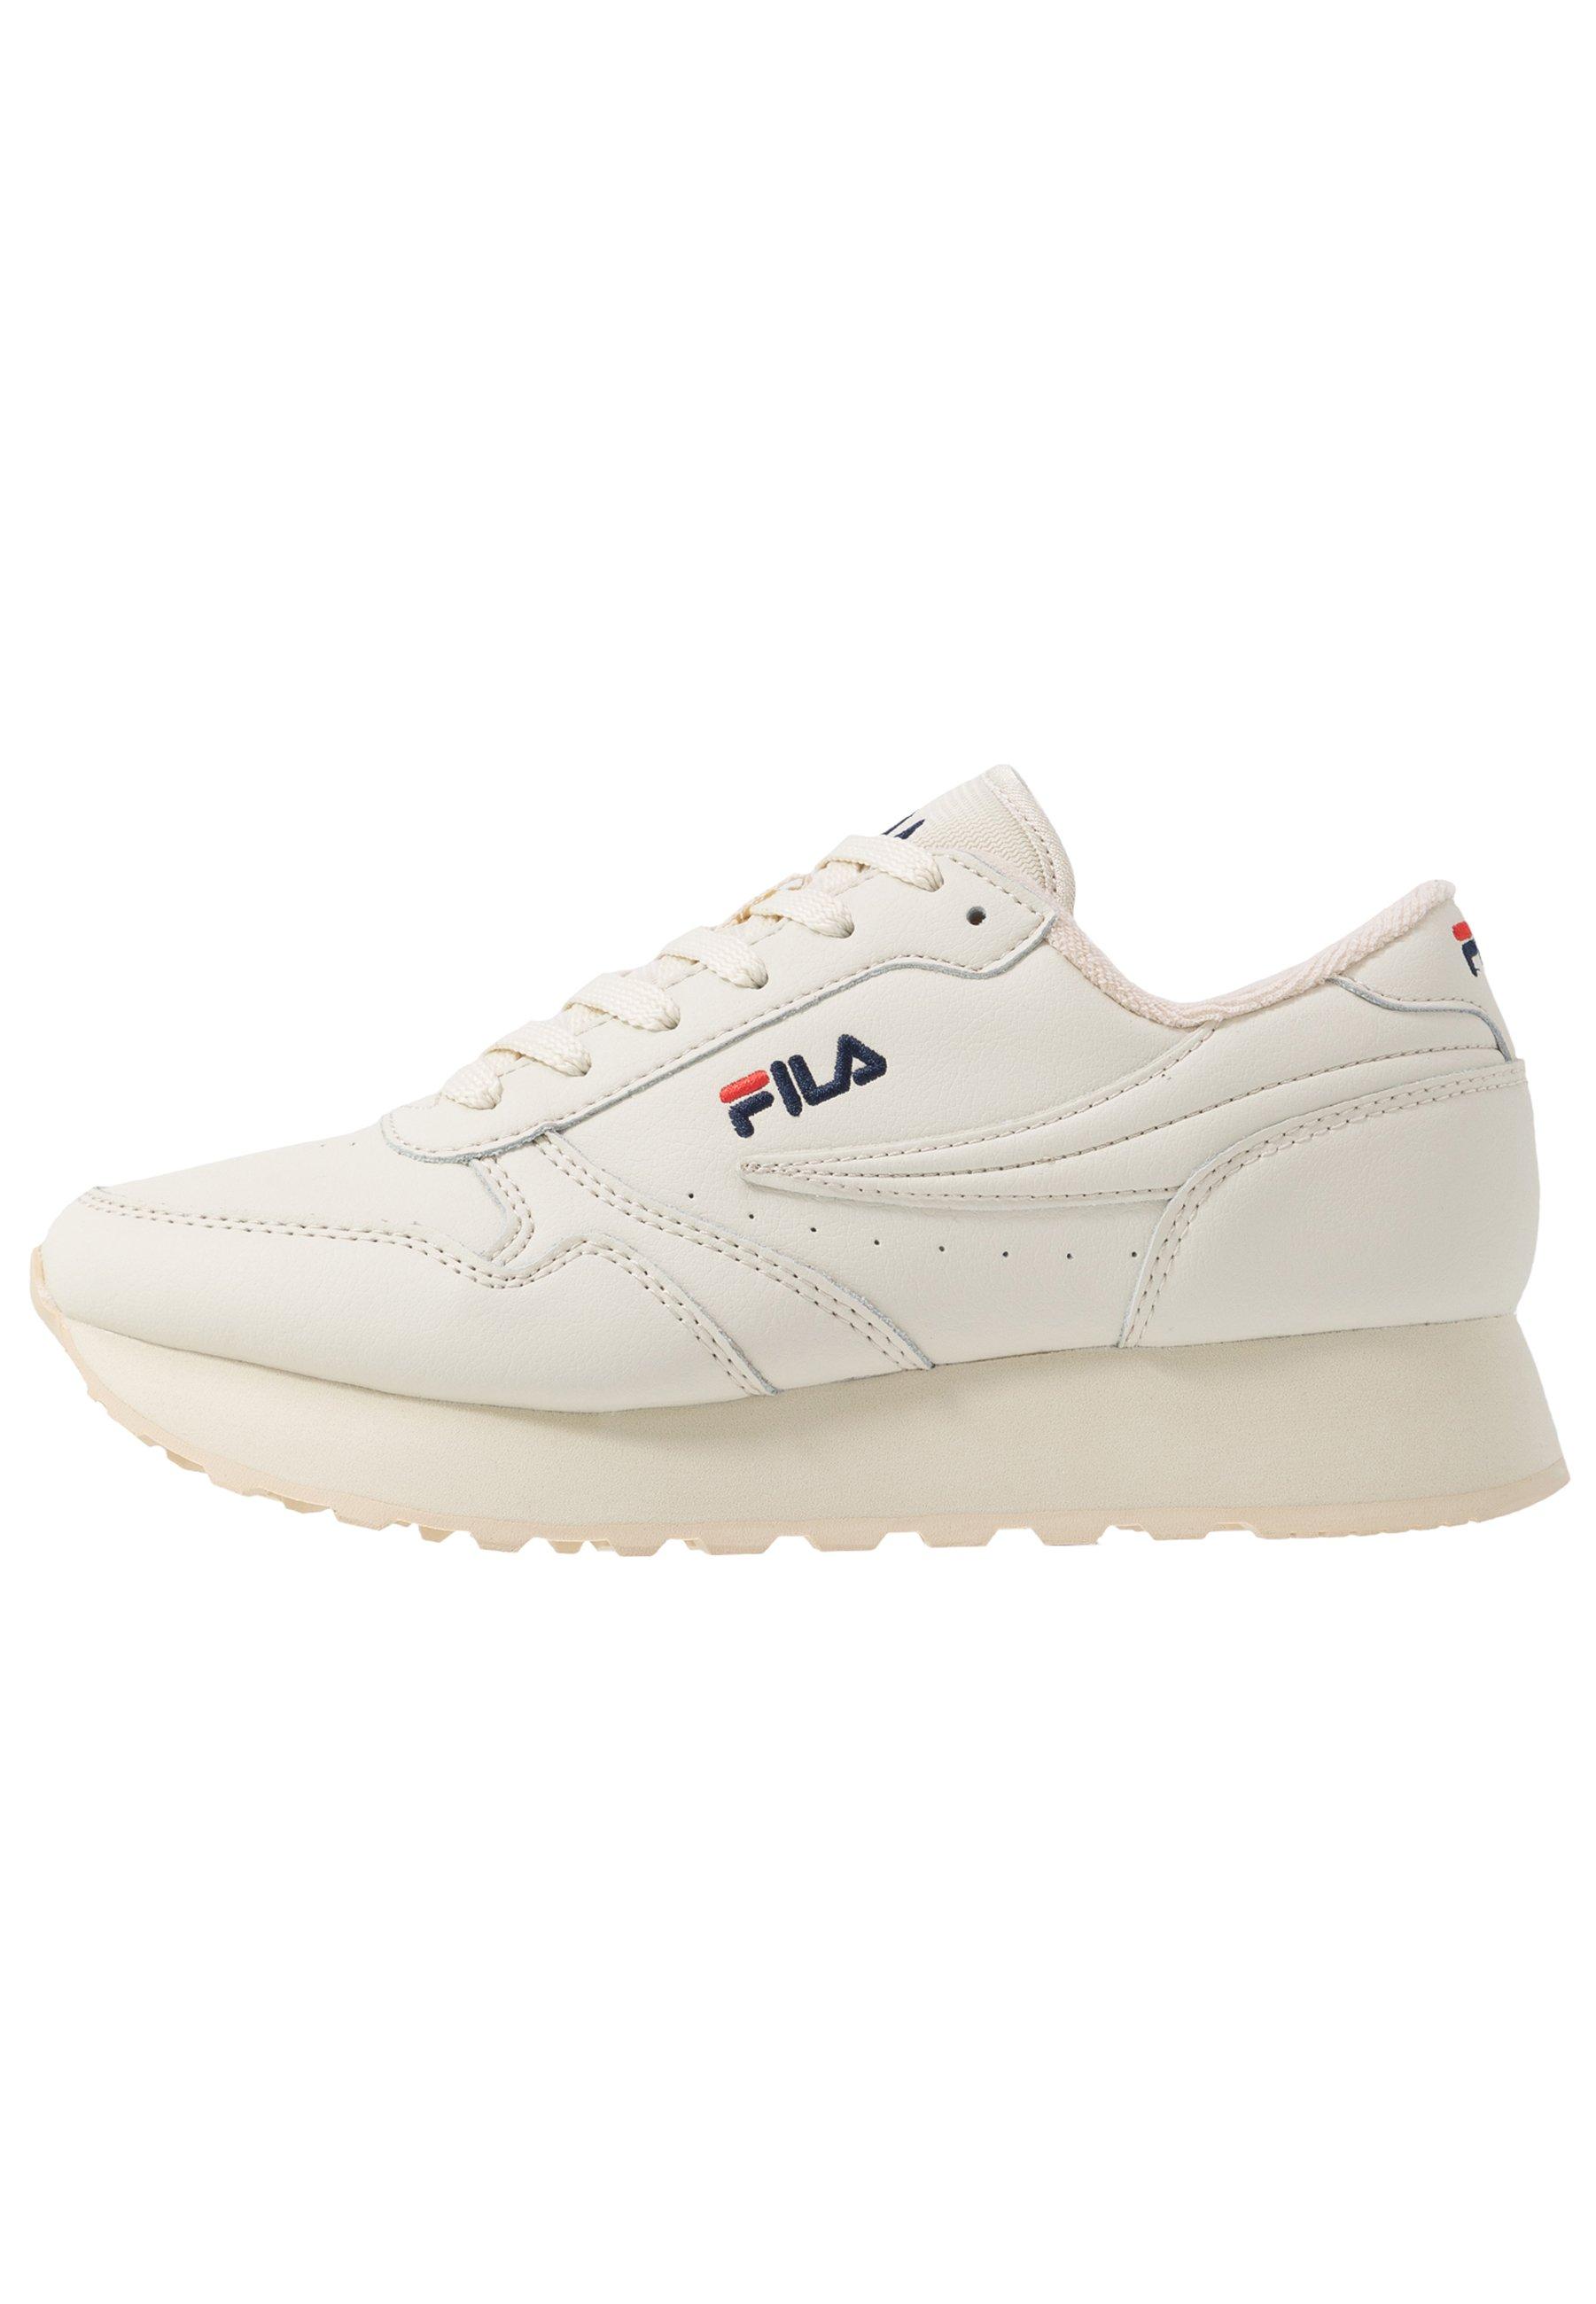 ORBIT ZEPPA Sneakers laag antique white